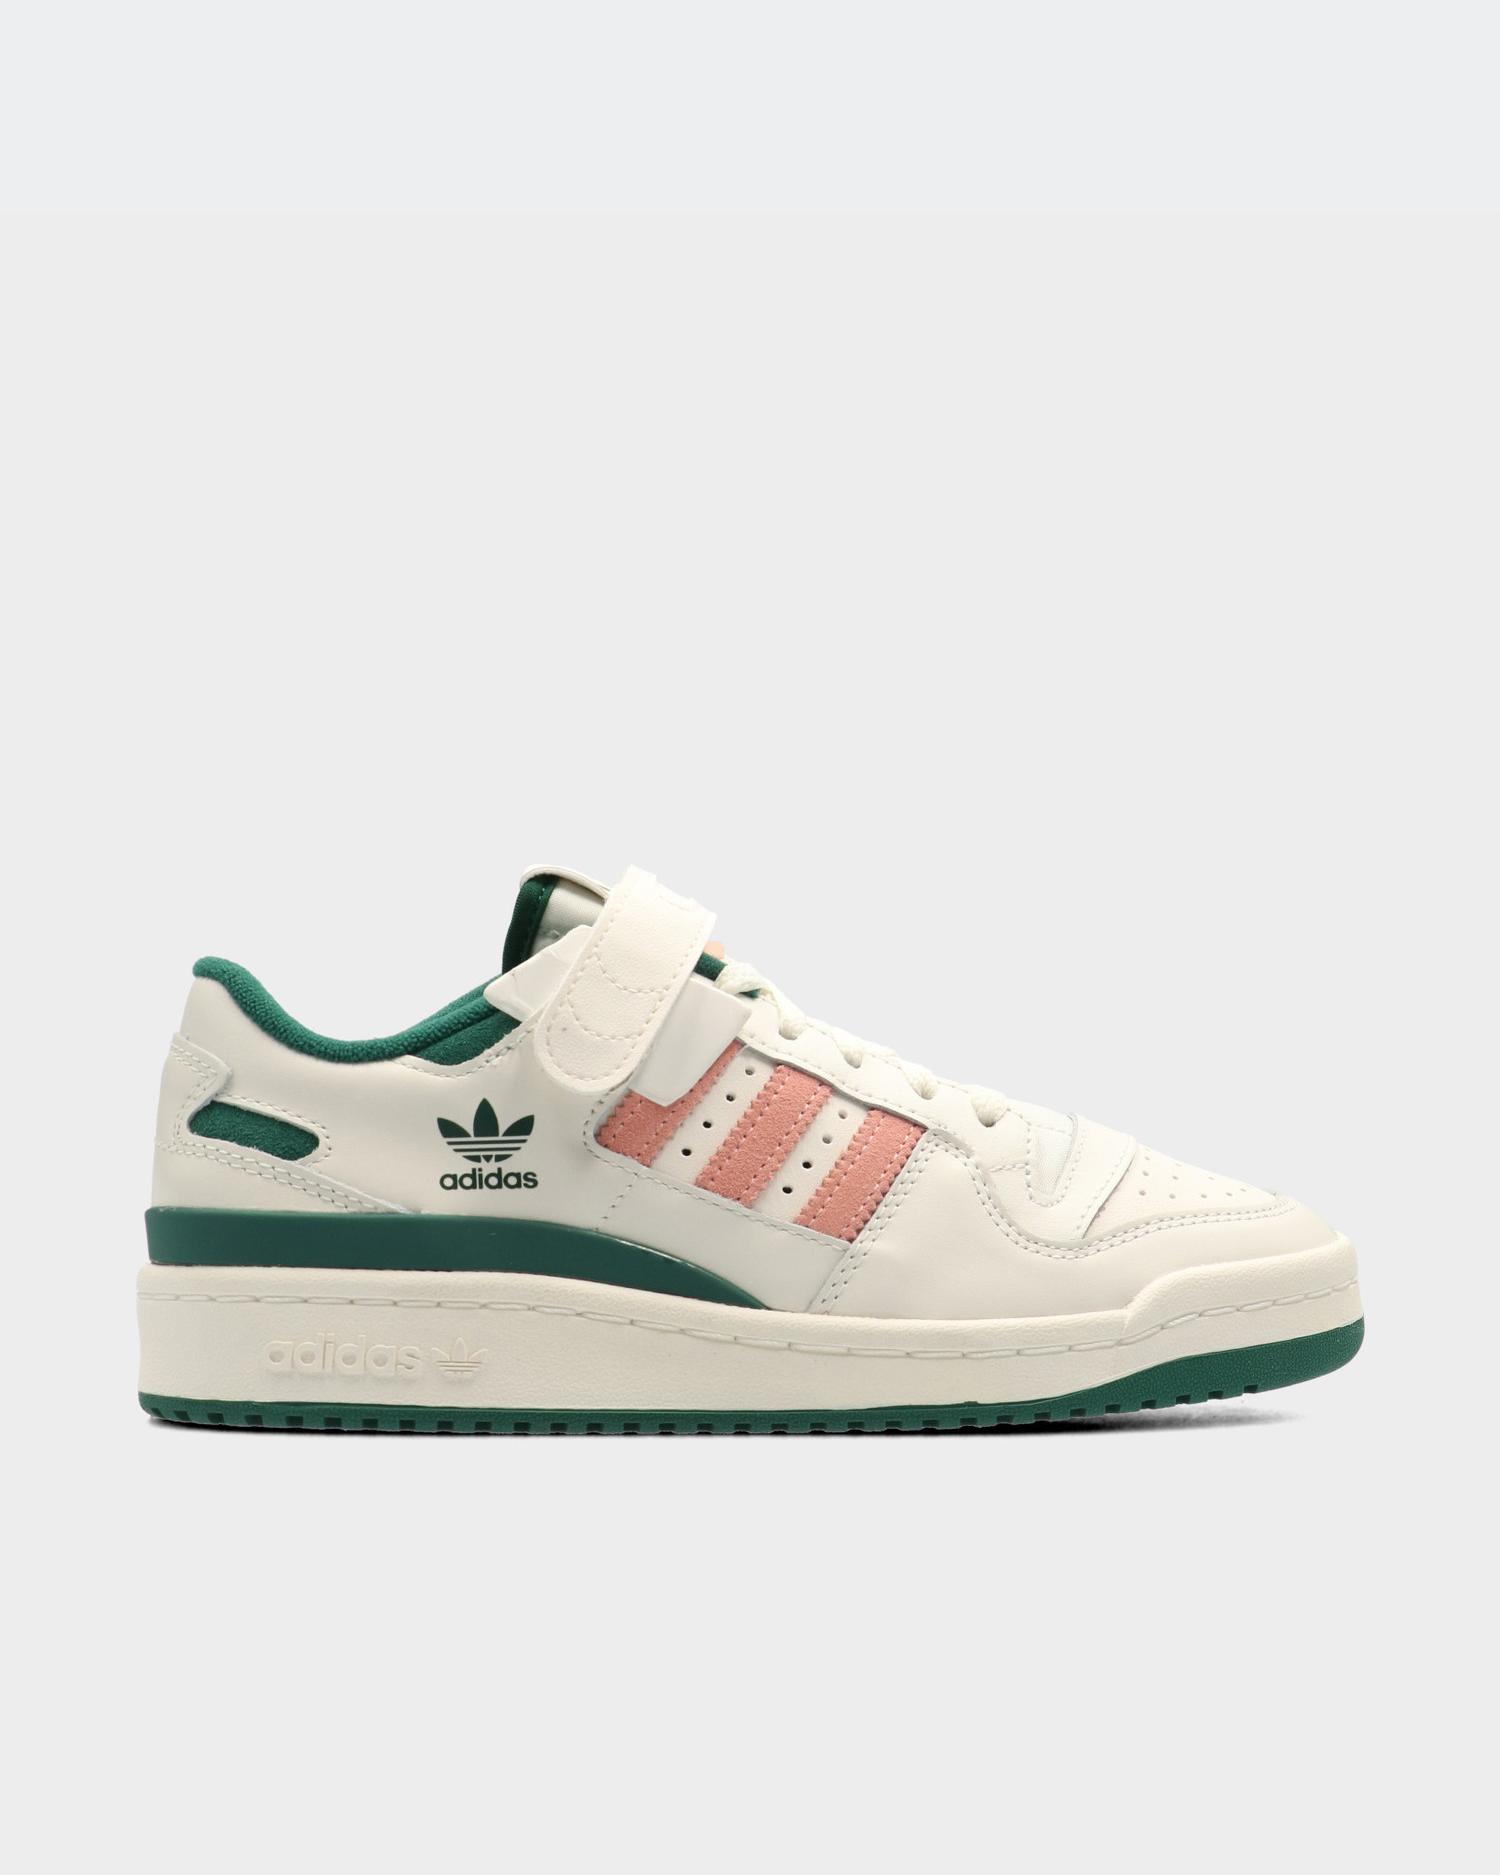 adidas Forum 84 Low Off White/Collegiate Green/Glow Pink